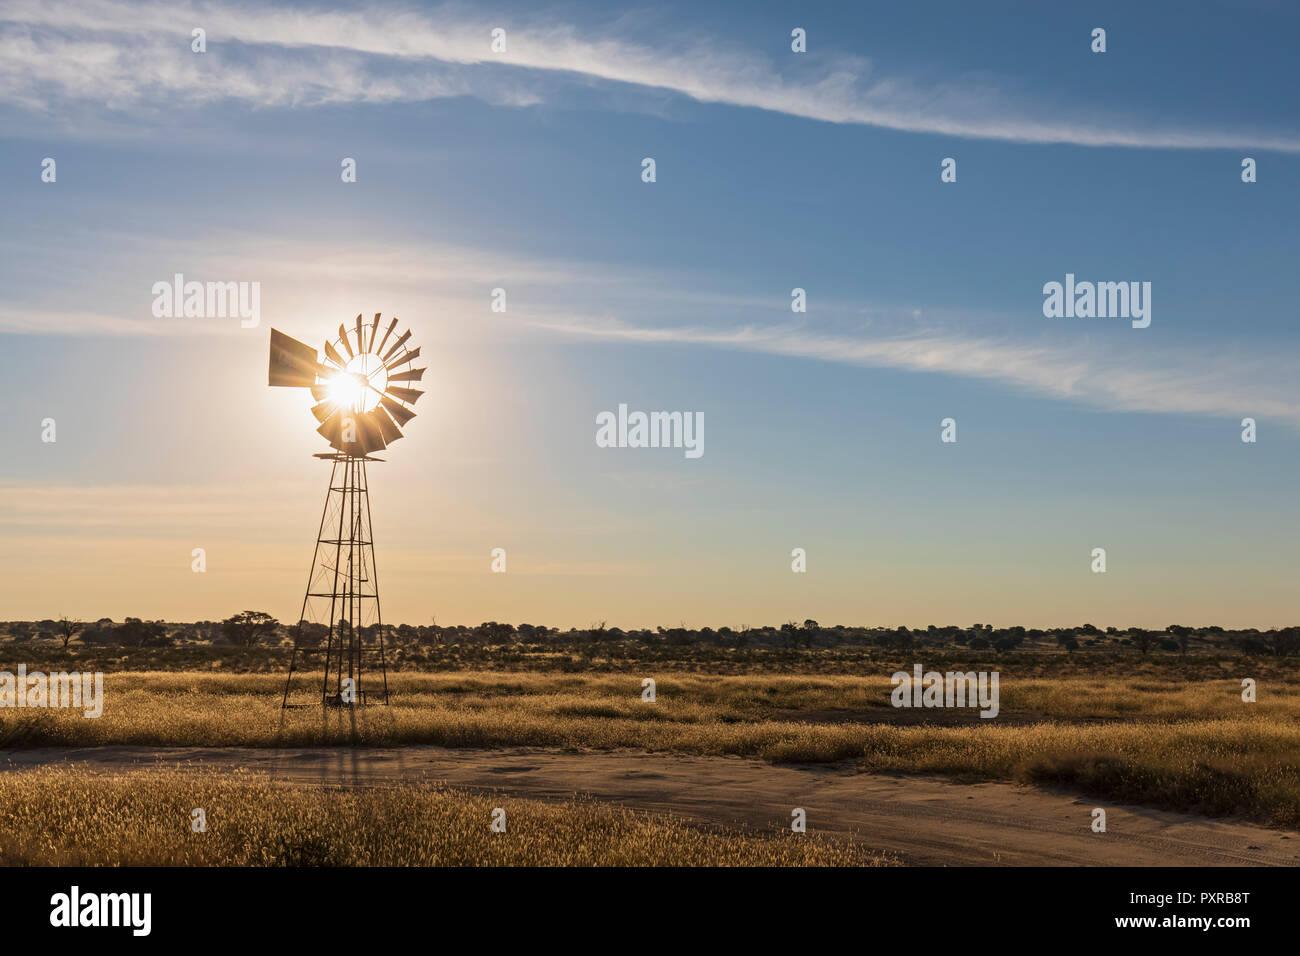 Africa, Botswana, Kgalagadi Transfrontier Park, Kalahari, wind wheel at waterhole Lanklaas - Stock Image